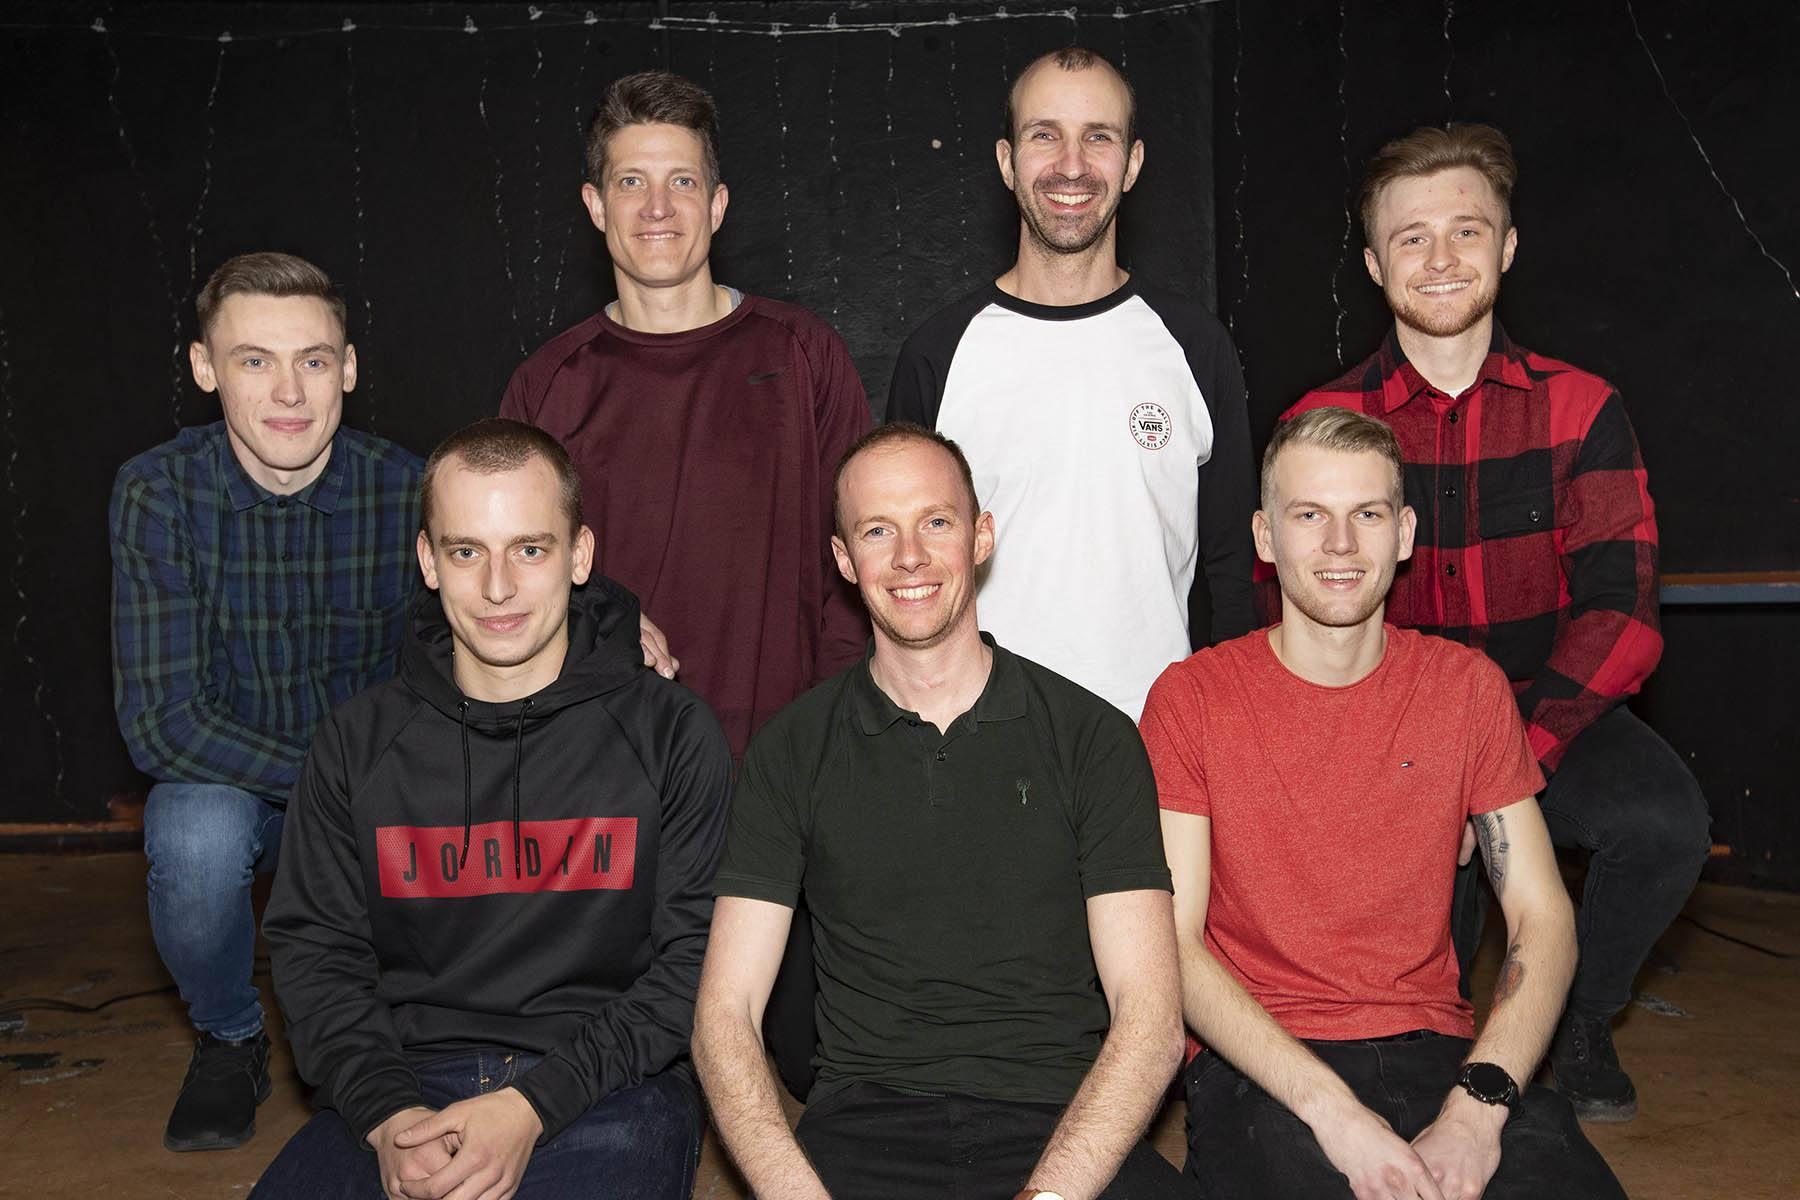 The 2020 Newcastle Diamonds. L-R: Max Clegg, Ondrej Smetana, Claus Vissing, James Wright, Matthew Wethers, Nick Skorja, Connor Mountain